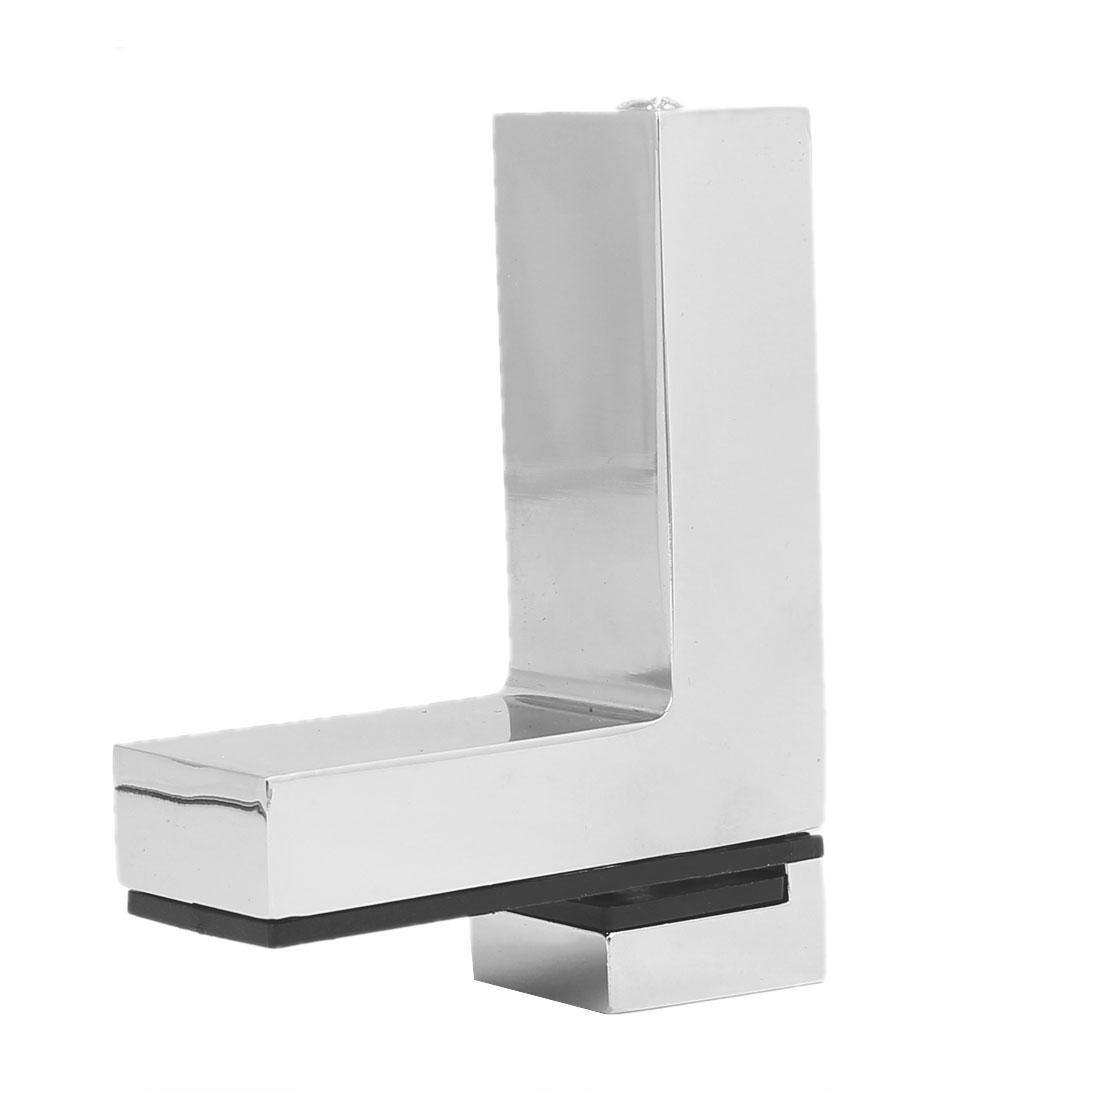 Wall Cabinet Metal Adjustable Glass Clip Shelf Clamp Support Bracket Holder - image 5 of 6